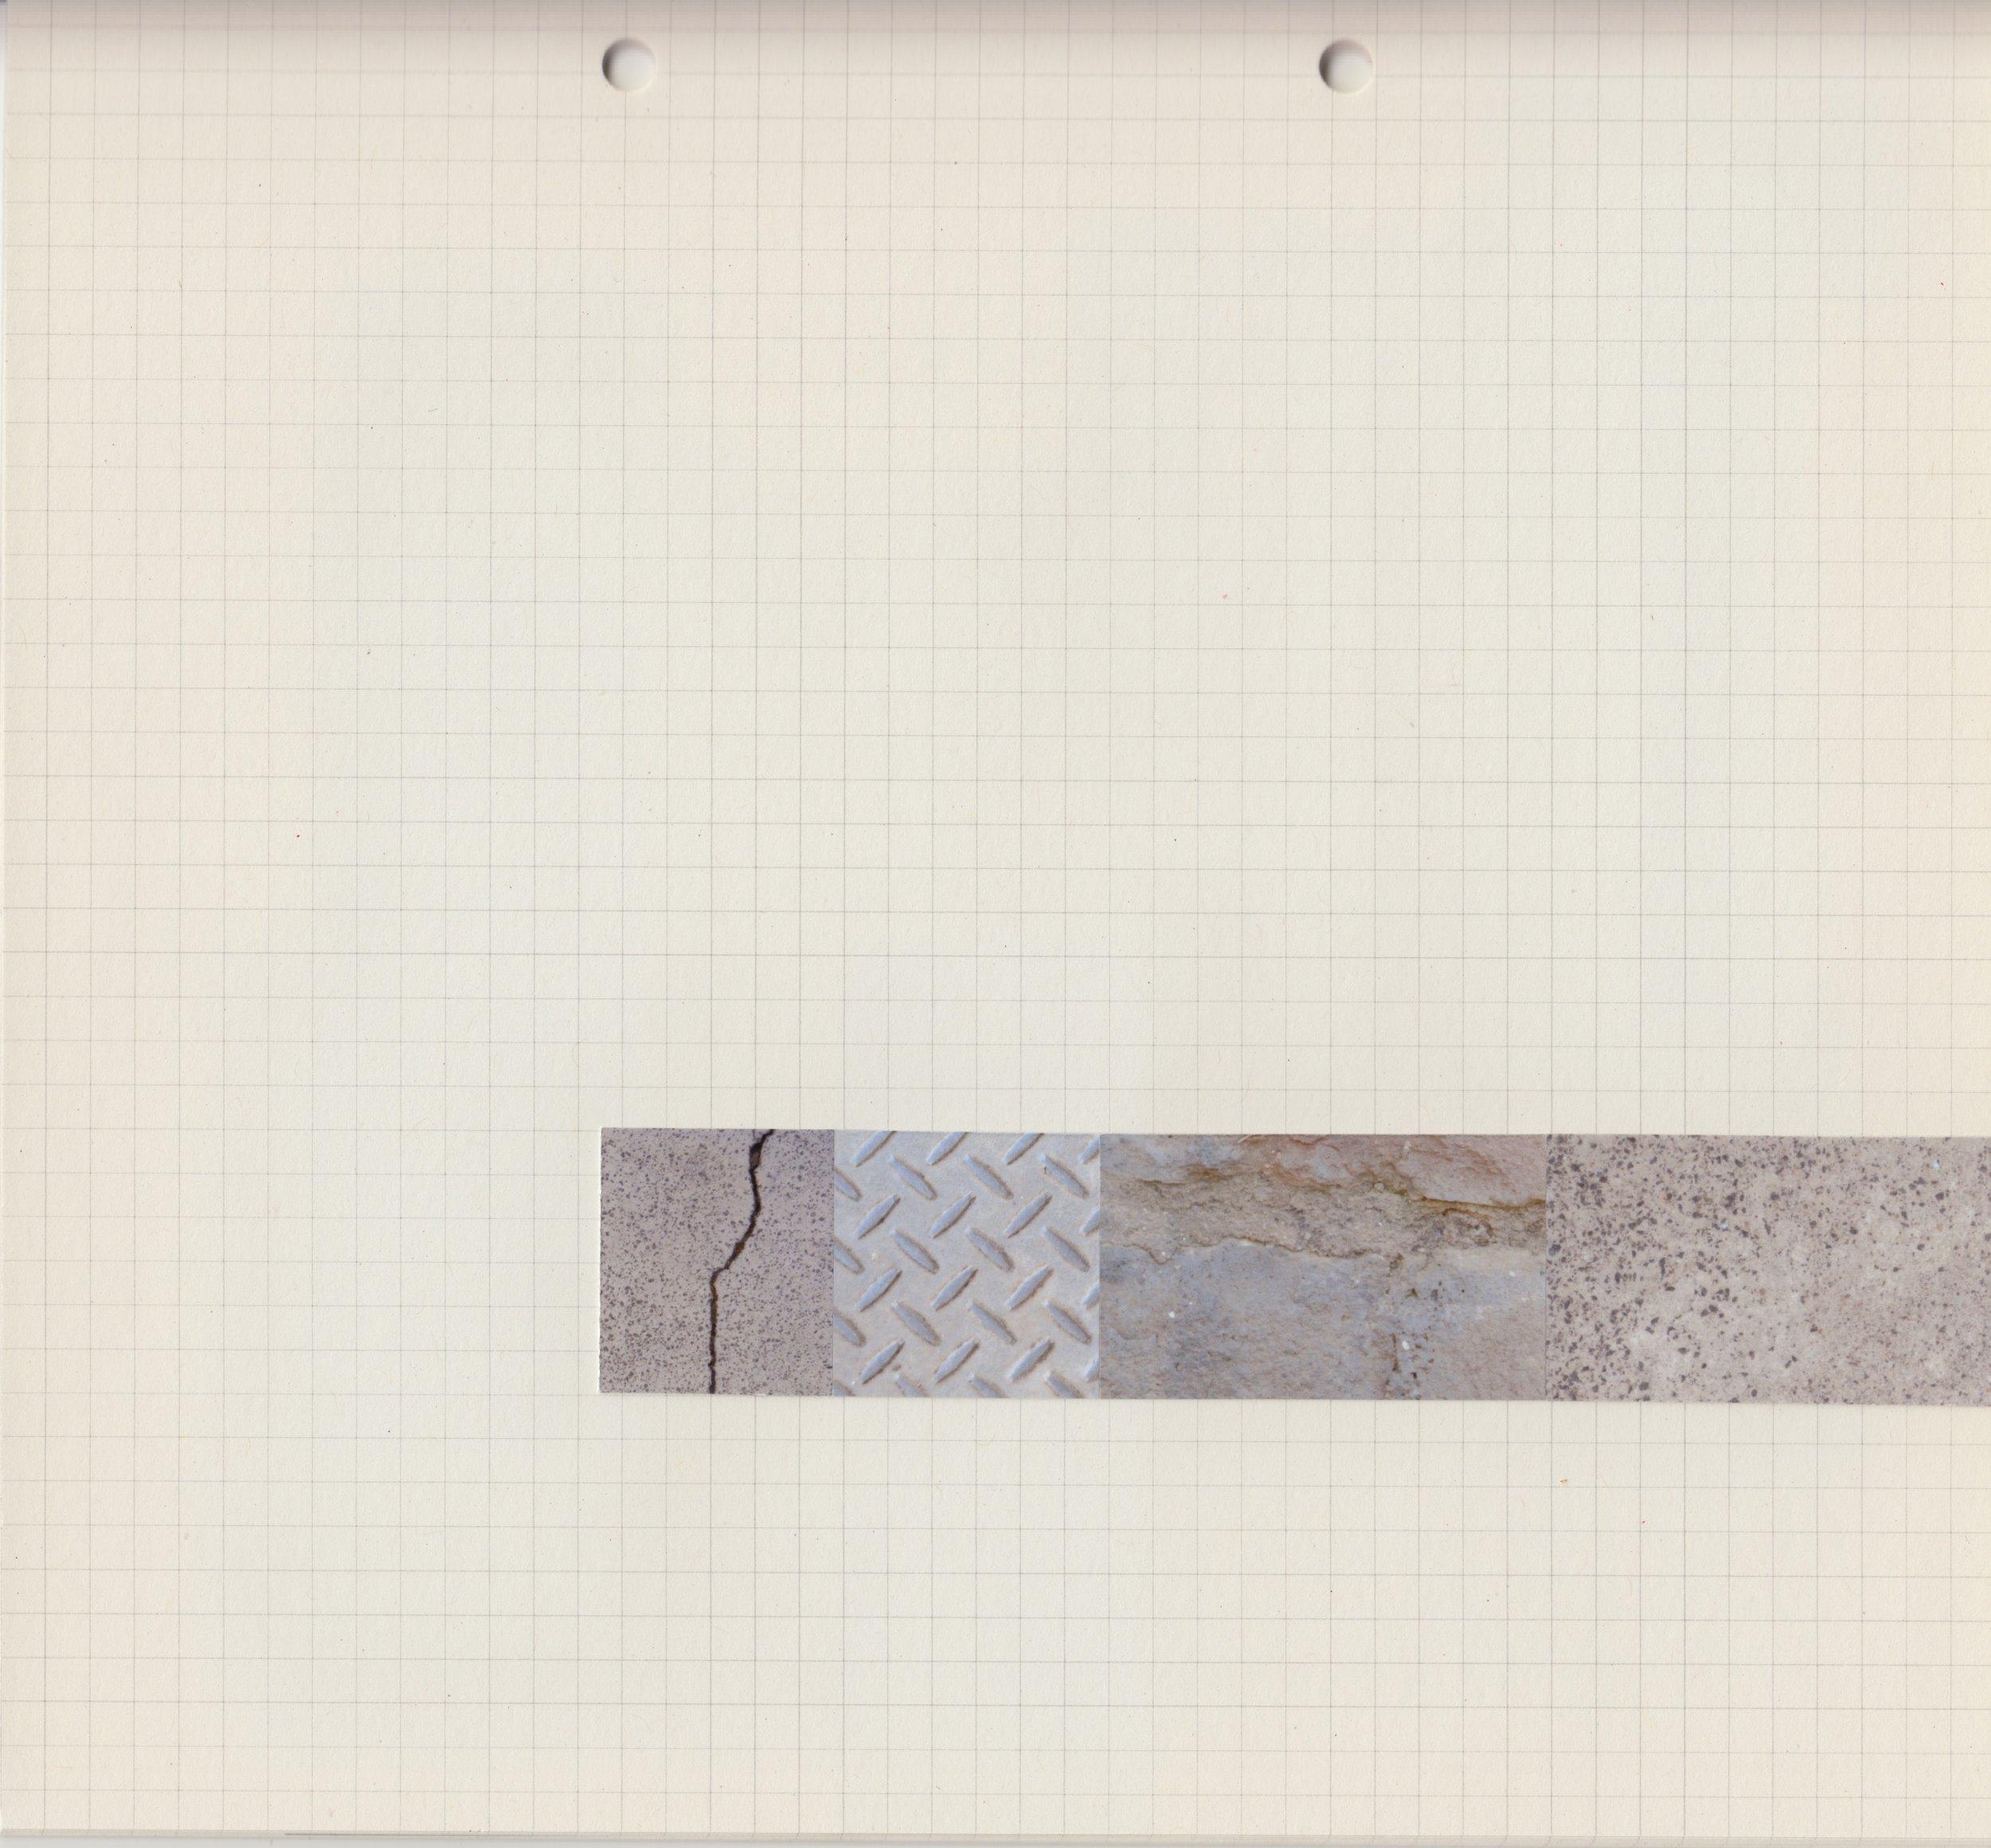 Remnant-collage 20.jpeg